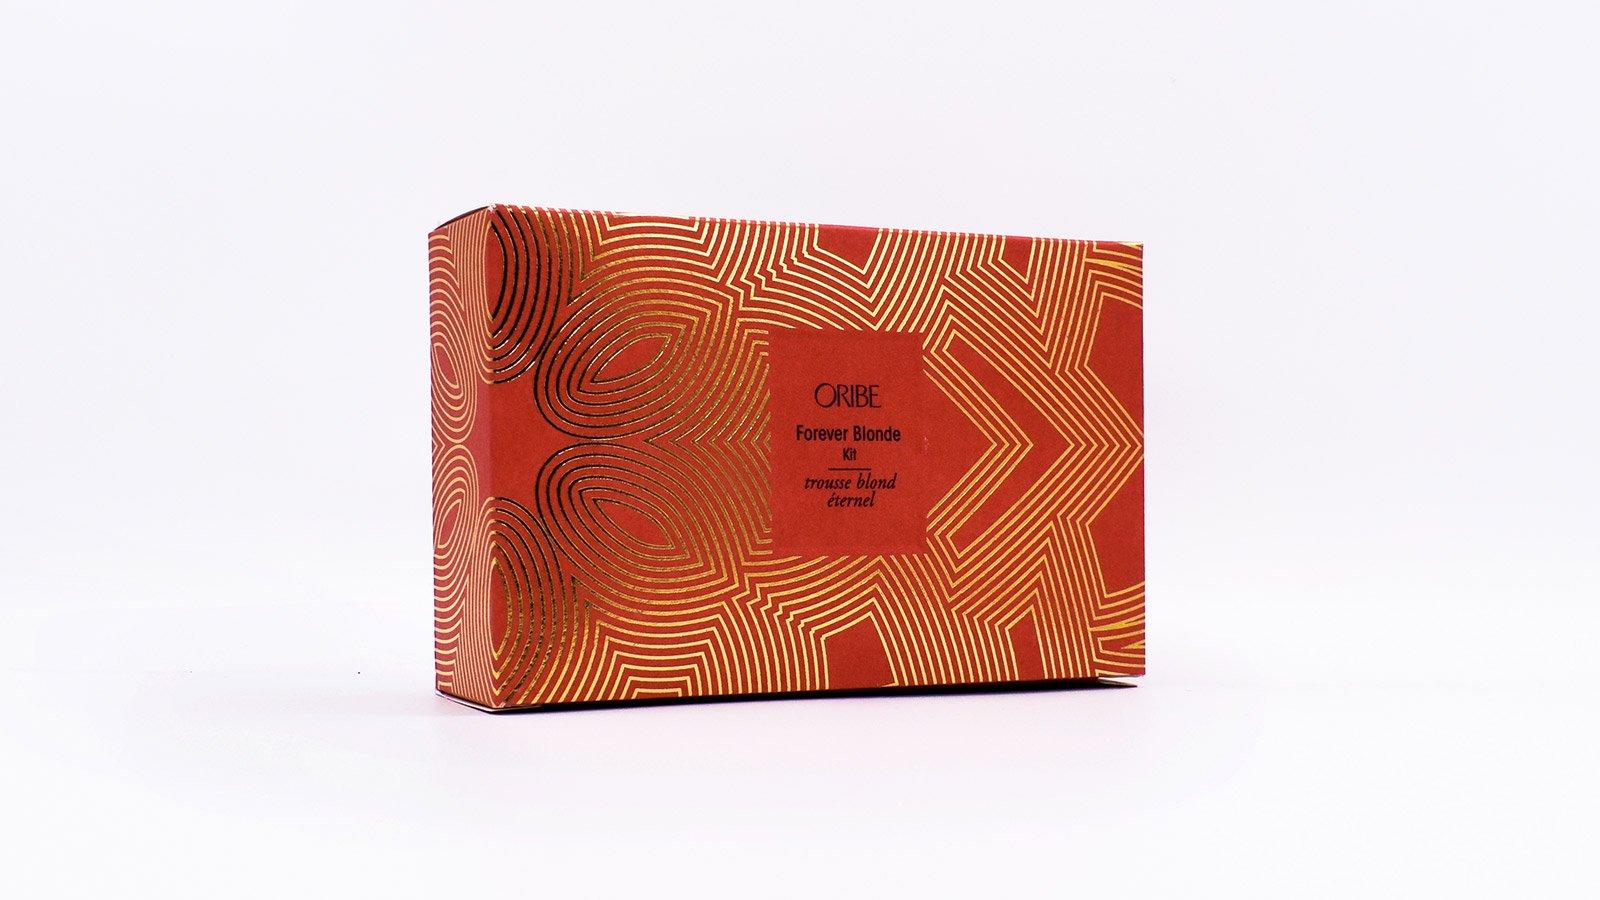 ORIBE Foil Packaging